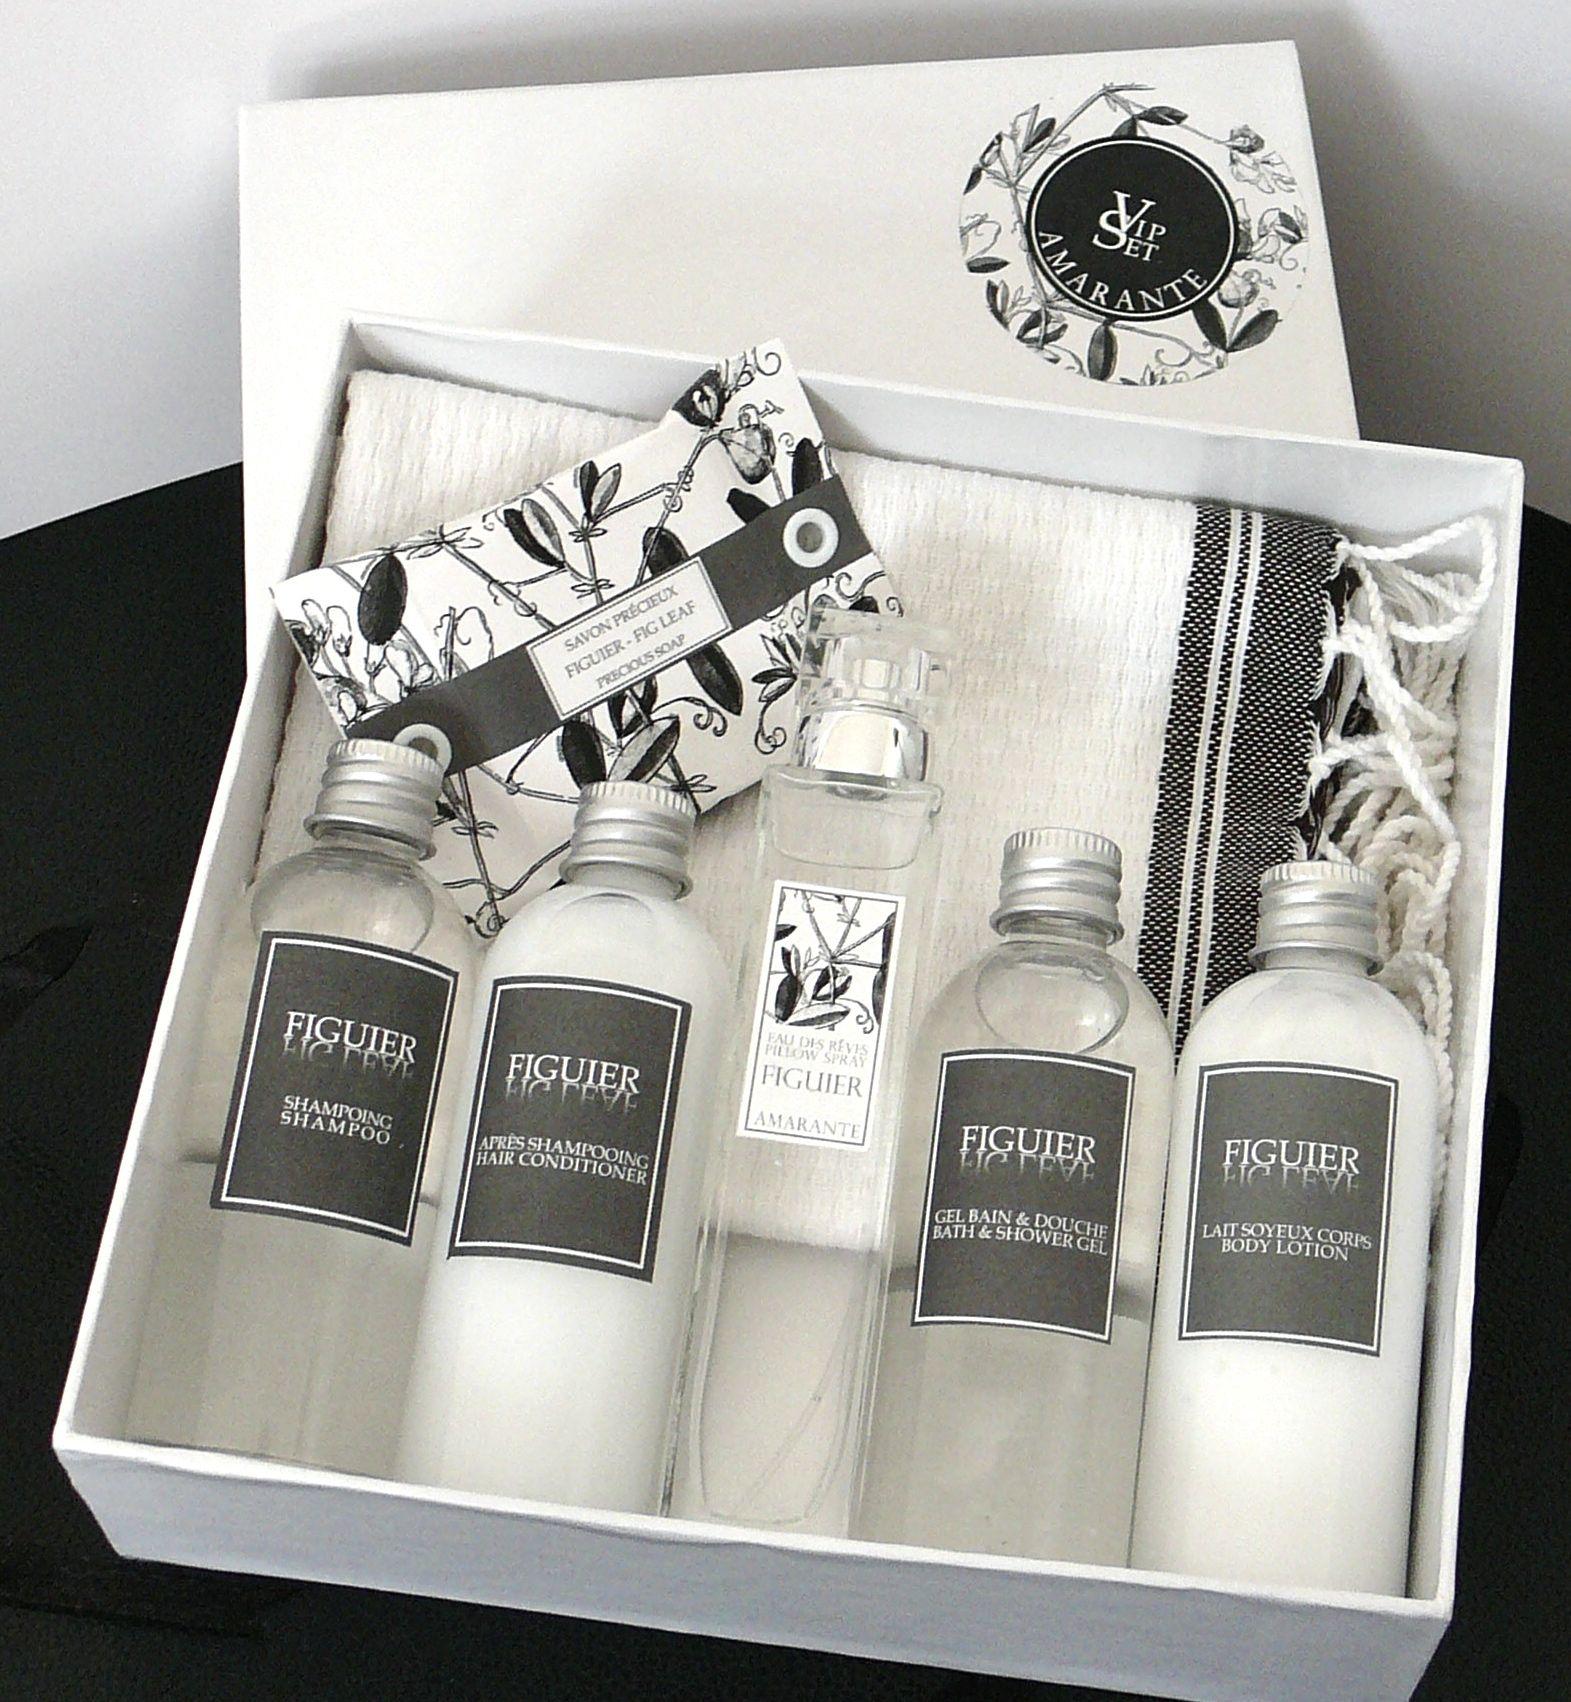 Branding & Packaging Hotels And Amenities